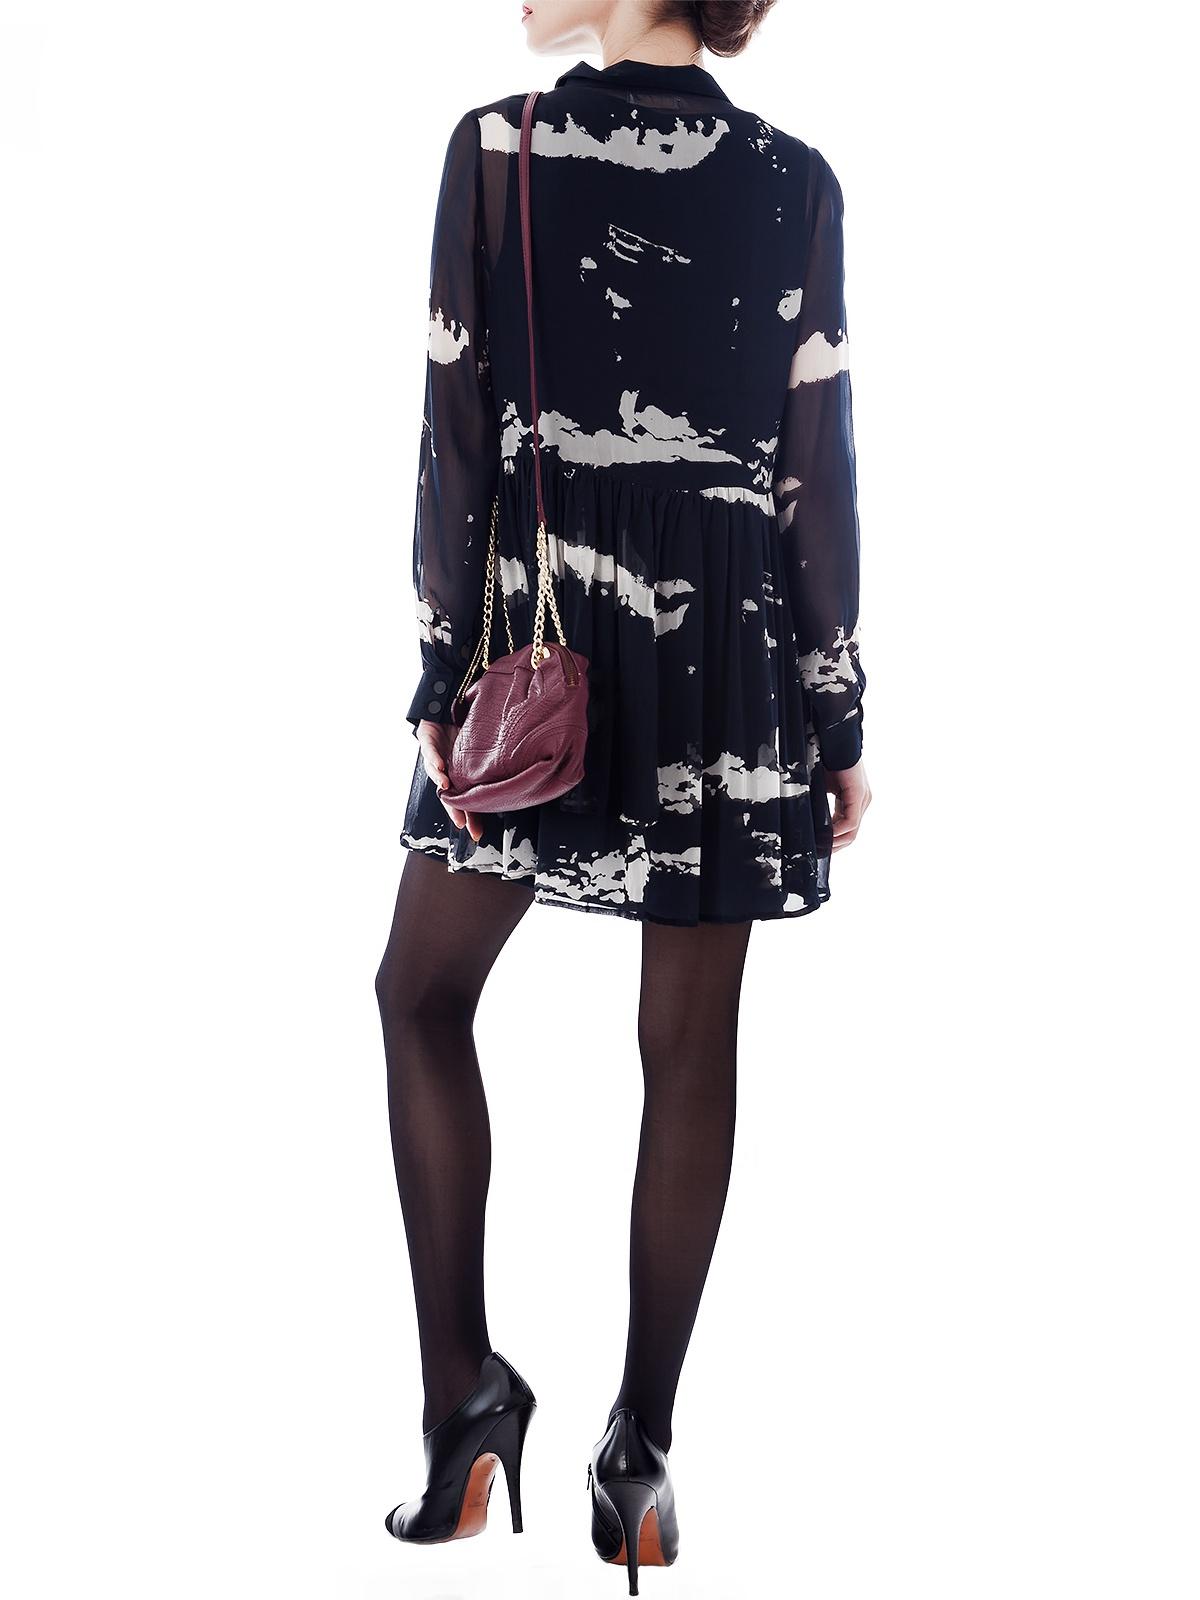 E-SENCE BURGUNDY LEATHER HANDBAG | GIRISSIMA.COM - Collectible fashion to love and to last